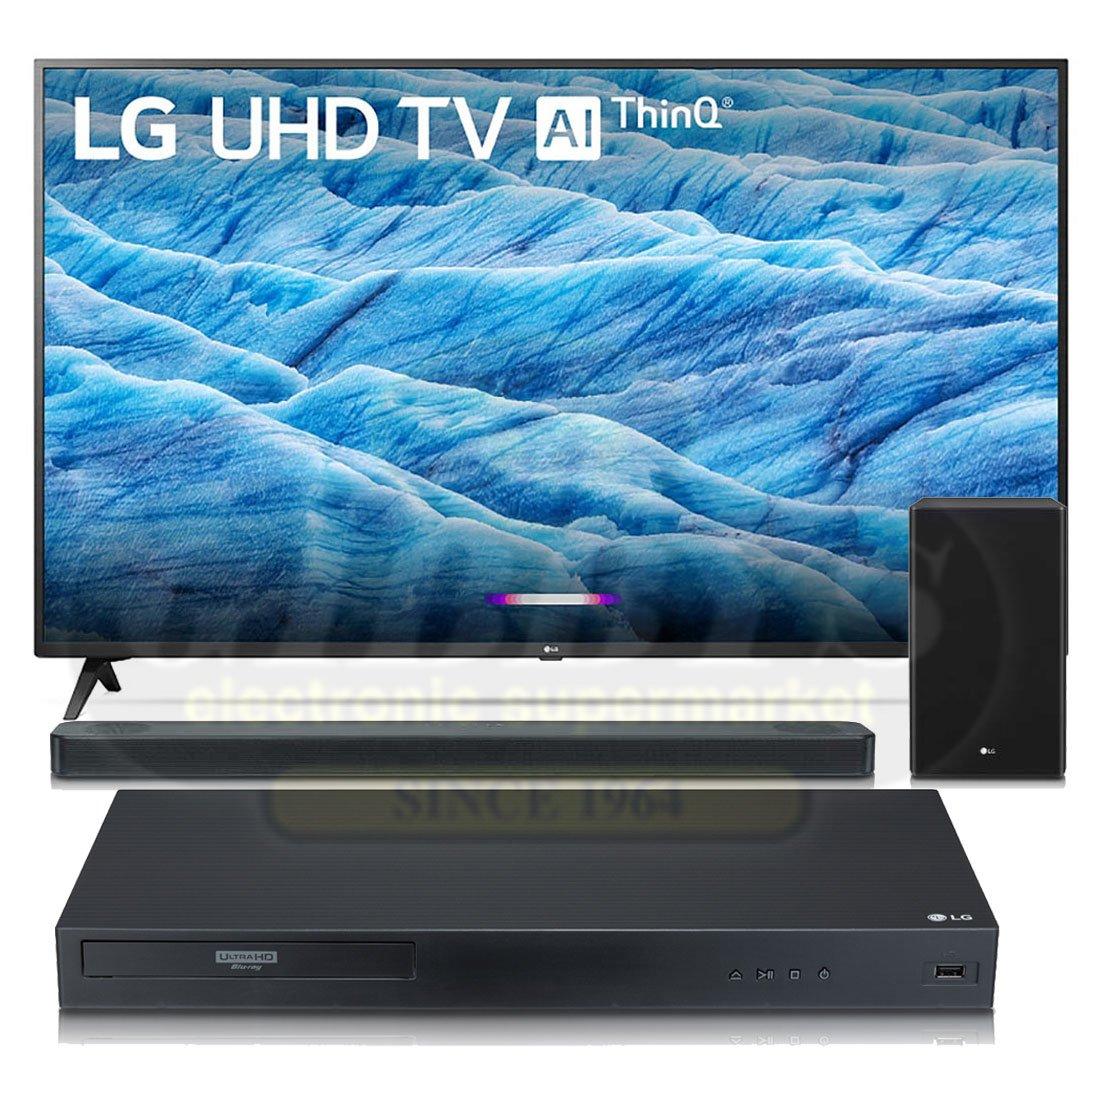 LG 55UM7300 55″ Class HDR 4K UHD Smart TV | LG SL8Y Soundbar | LG UBK90  Blu-ray